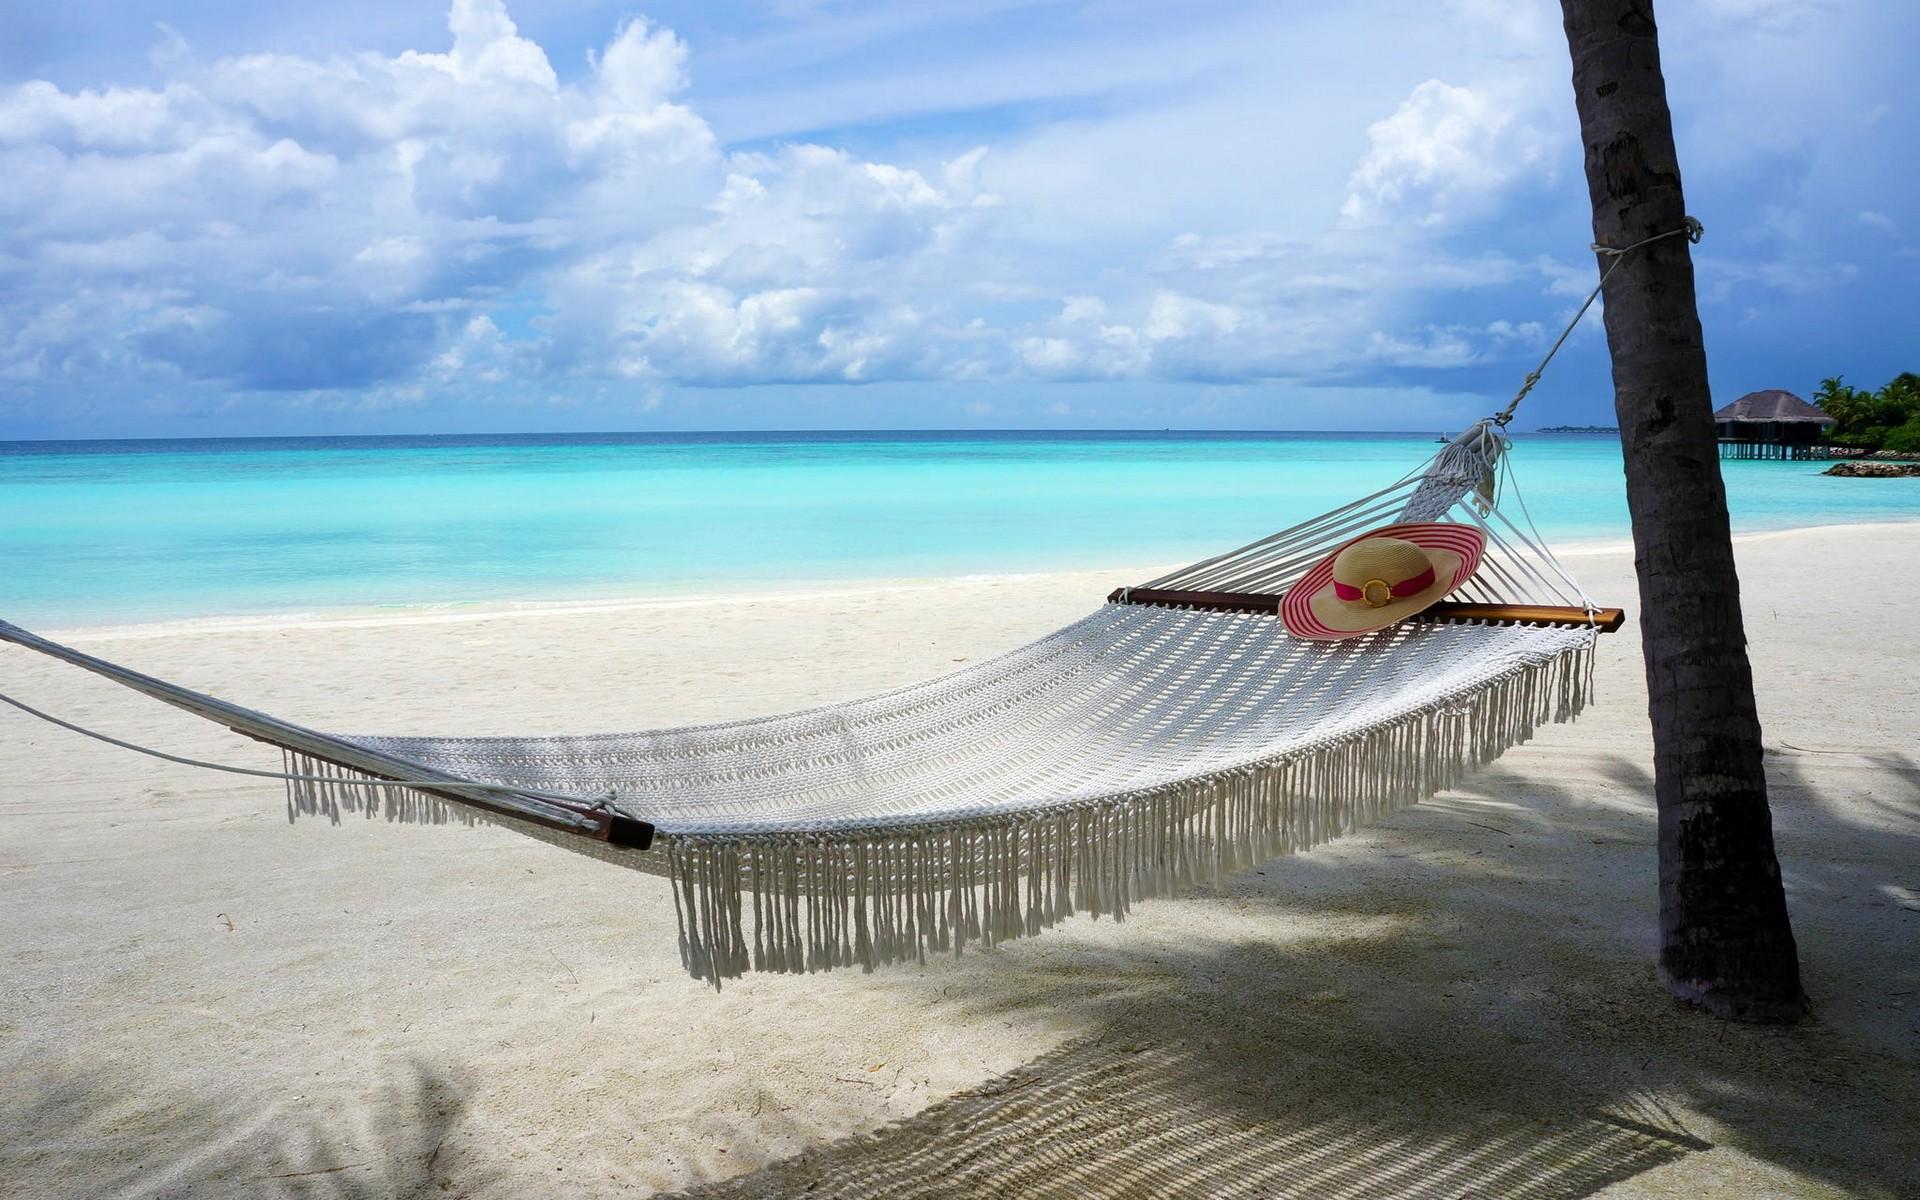 Fondos de pantalla rboles paisaje mar bah a naturaleza apuntalar arena nubes playa - Fotos de hamacas en la playa ...